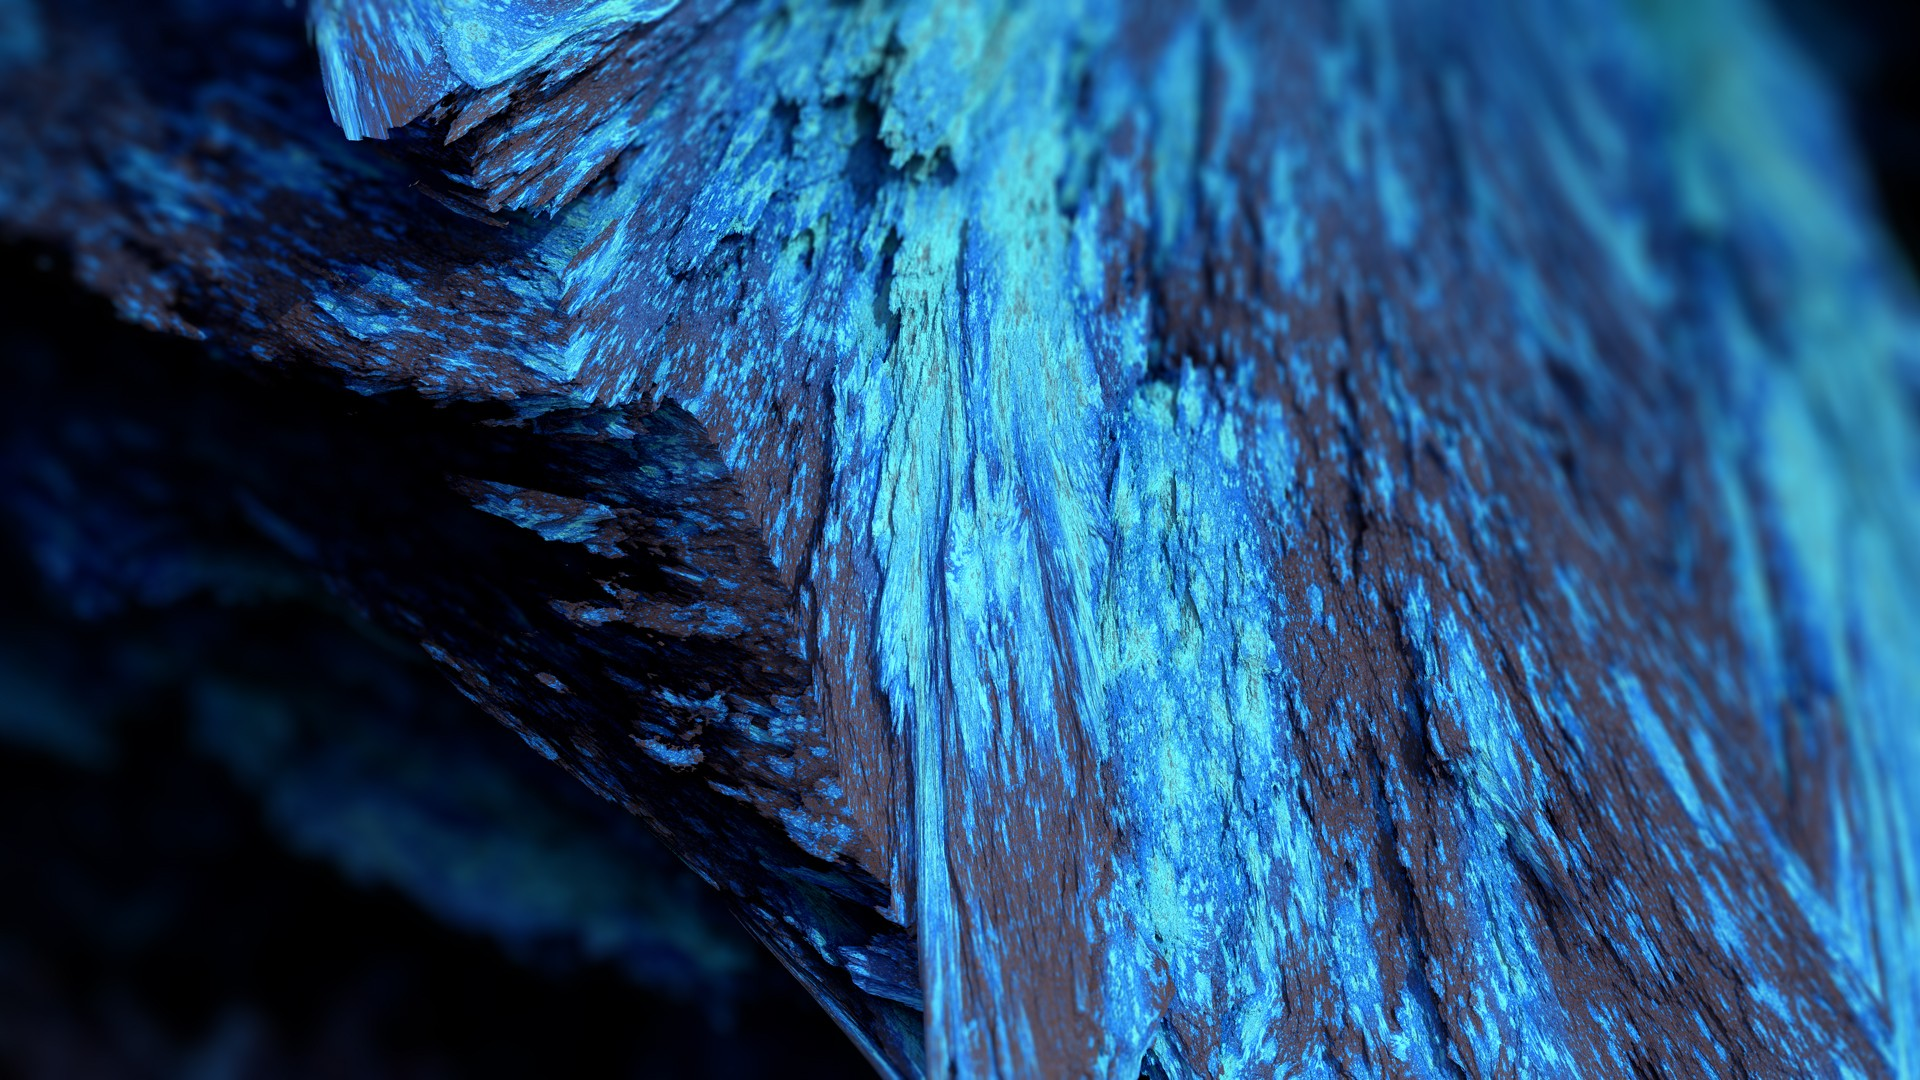 General 1920x1080 Procedural Minerals mineral blue depth of field abstract render CGI artwork digital art cyan